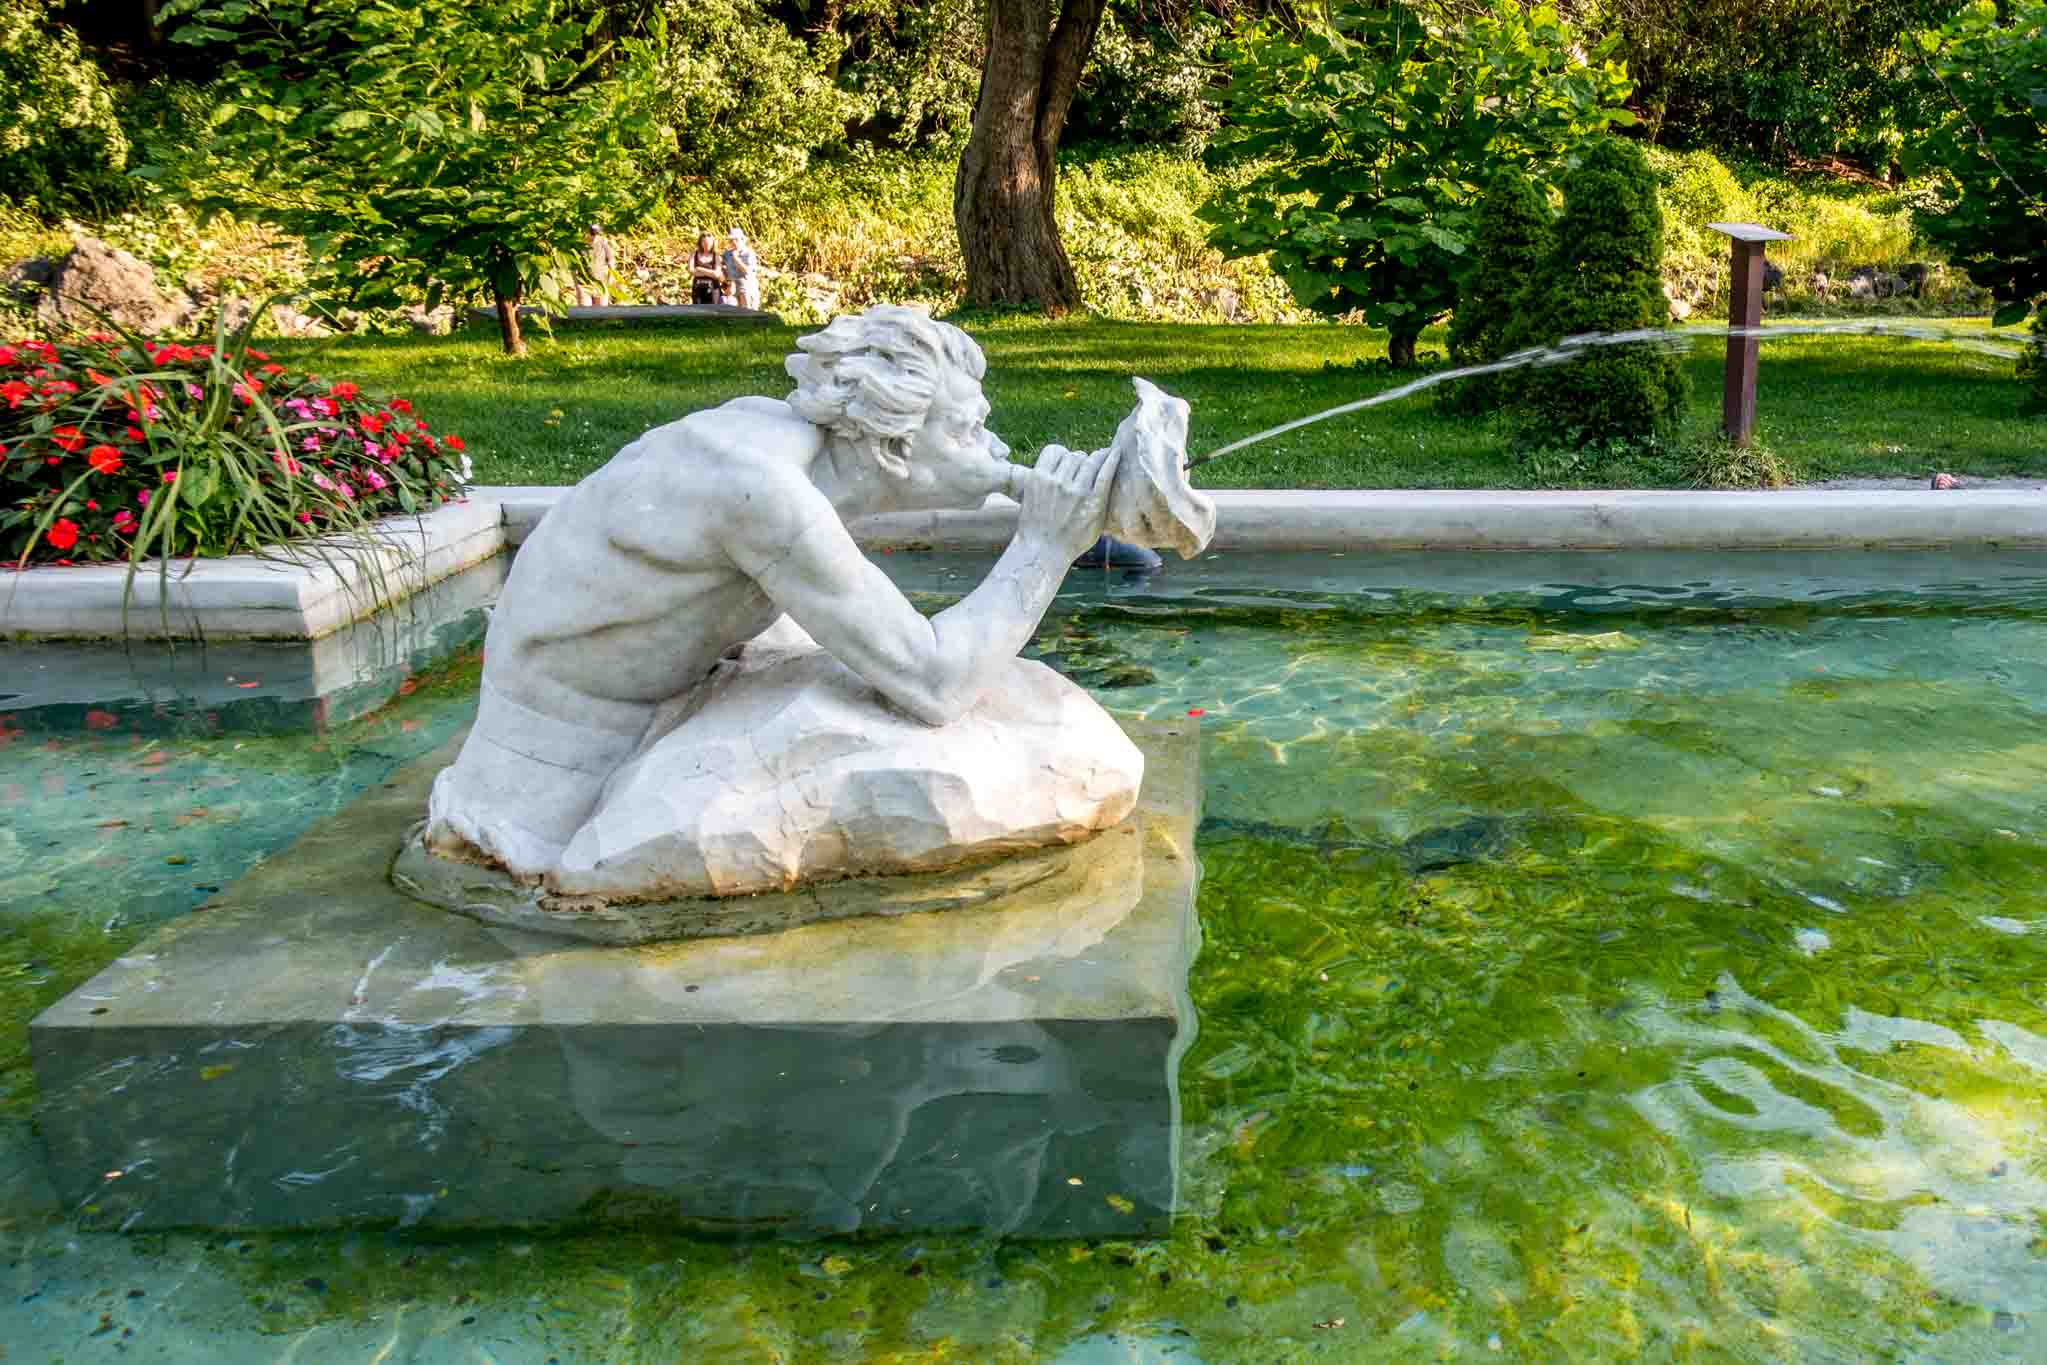 Mermen fountain spouting water